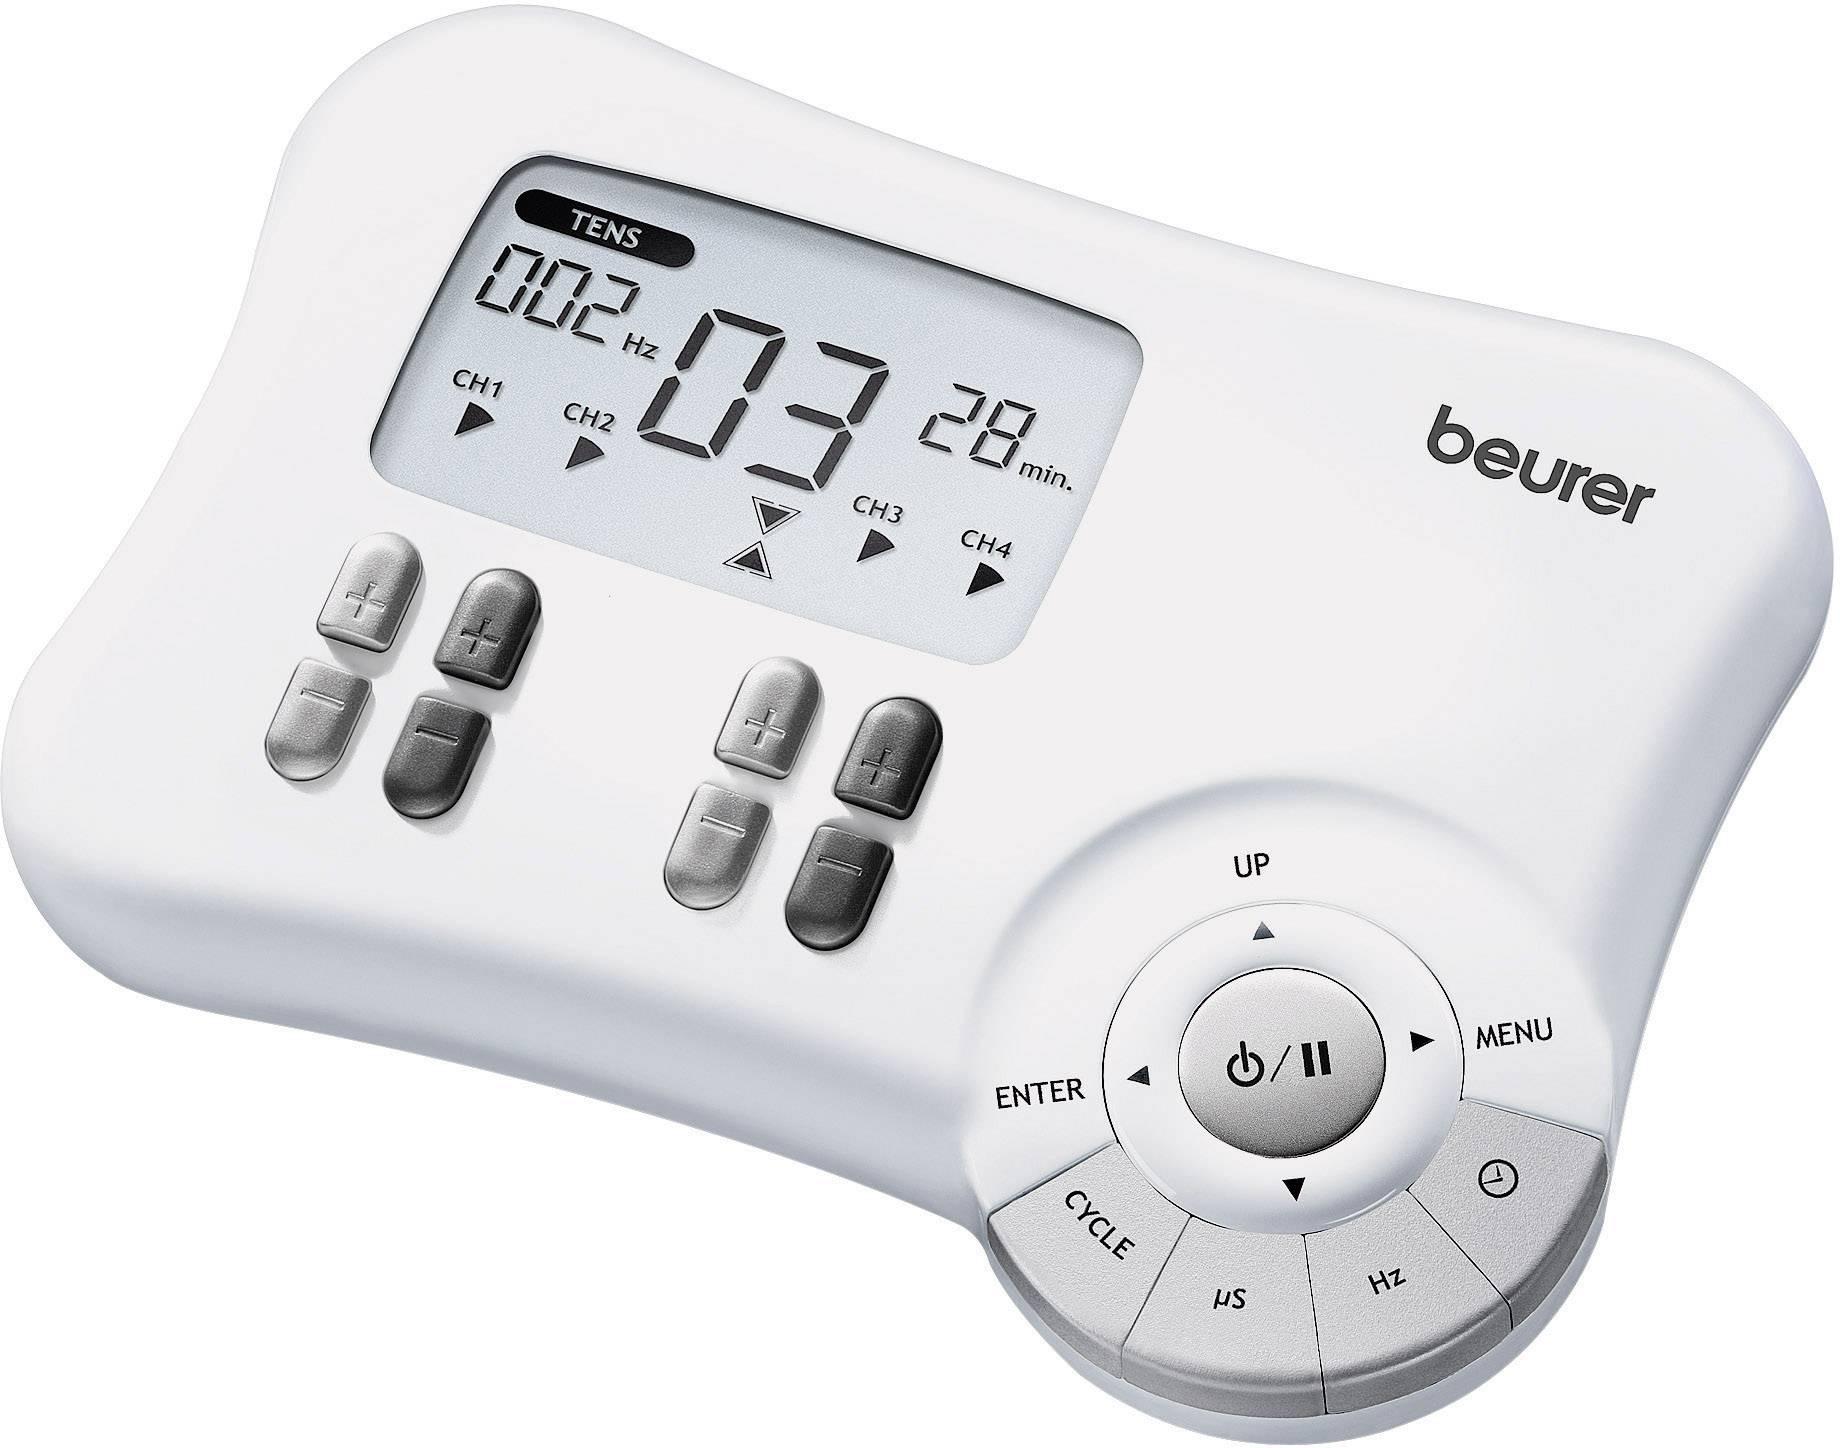 Digitální elektrostimulátor Beurer TENS/EMS EM 80